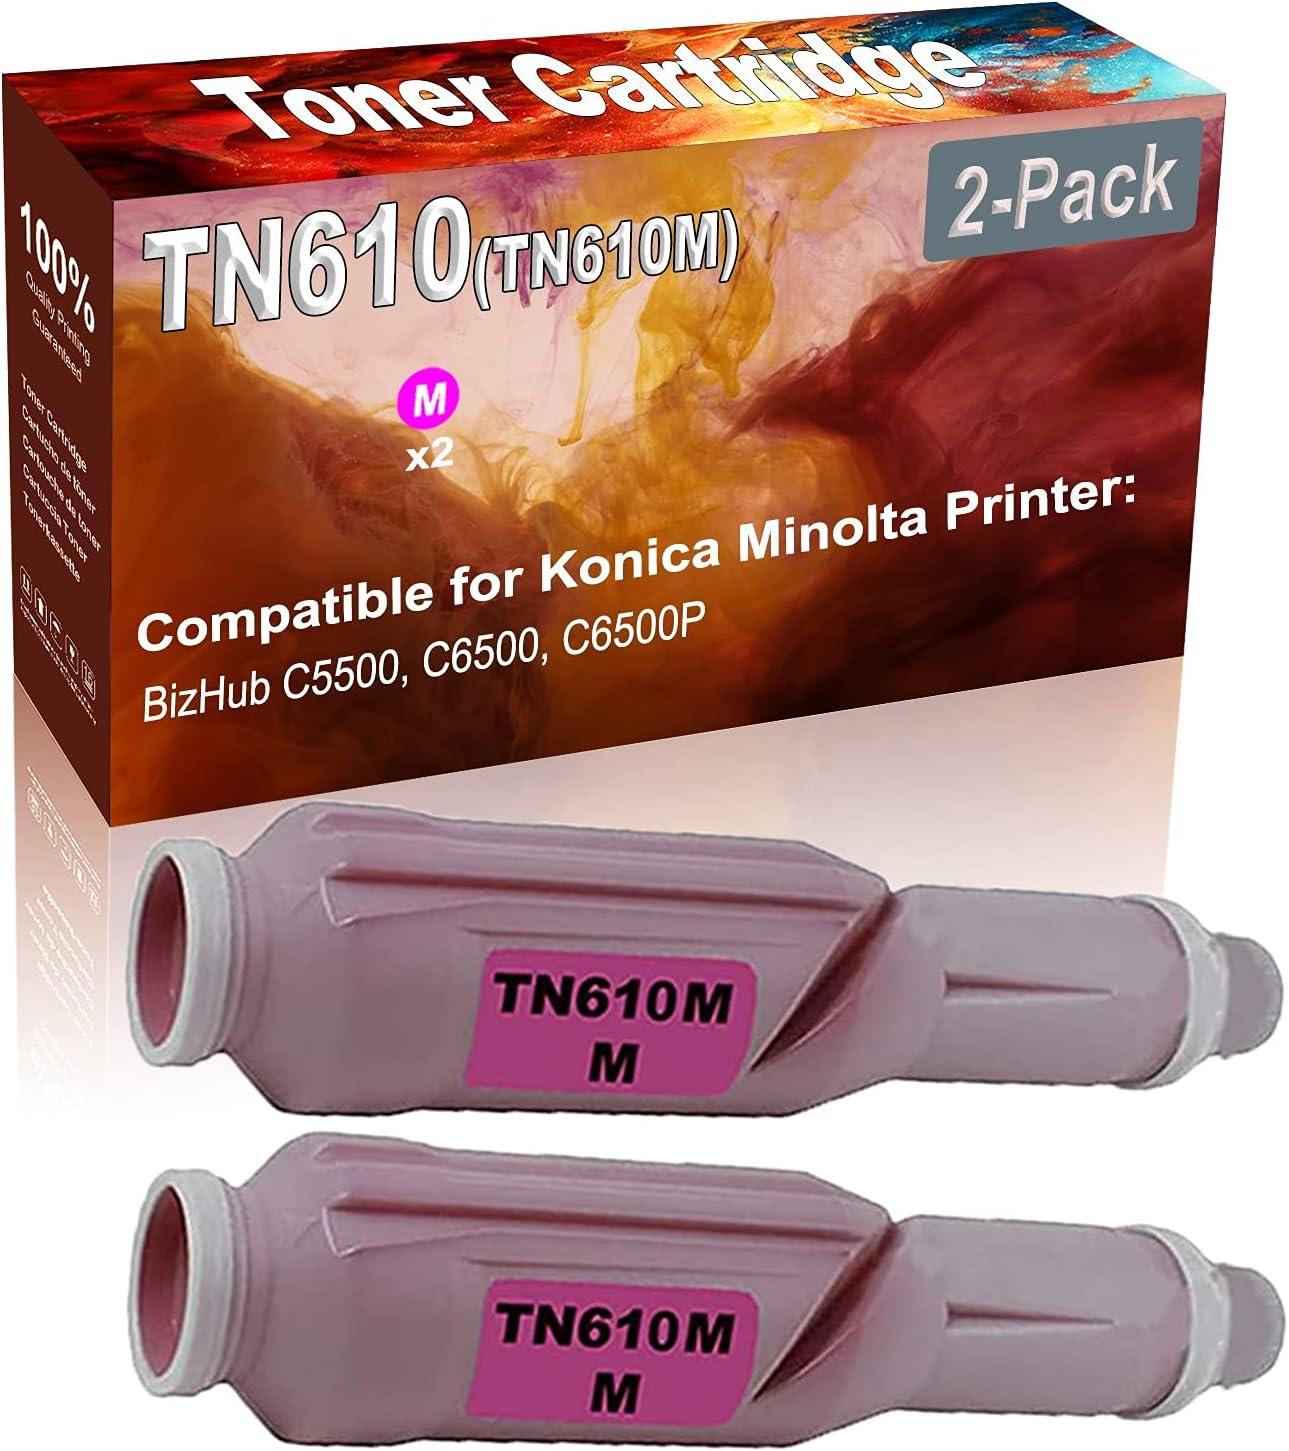 2-Pack (Magenta) Compatible High Yield TN610 (TN610M) Printer Toner Cartridge use for Konica Minolta BizHub C5500 C6500 C6500P Printers